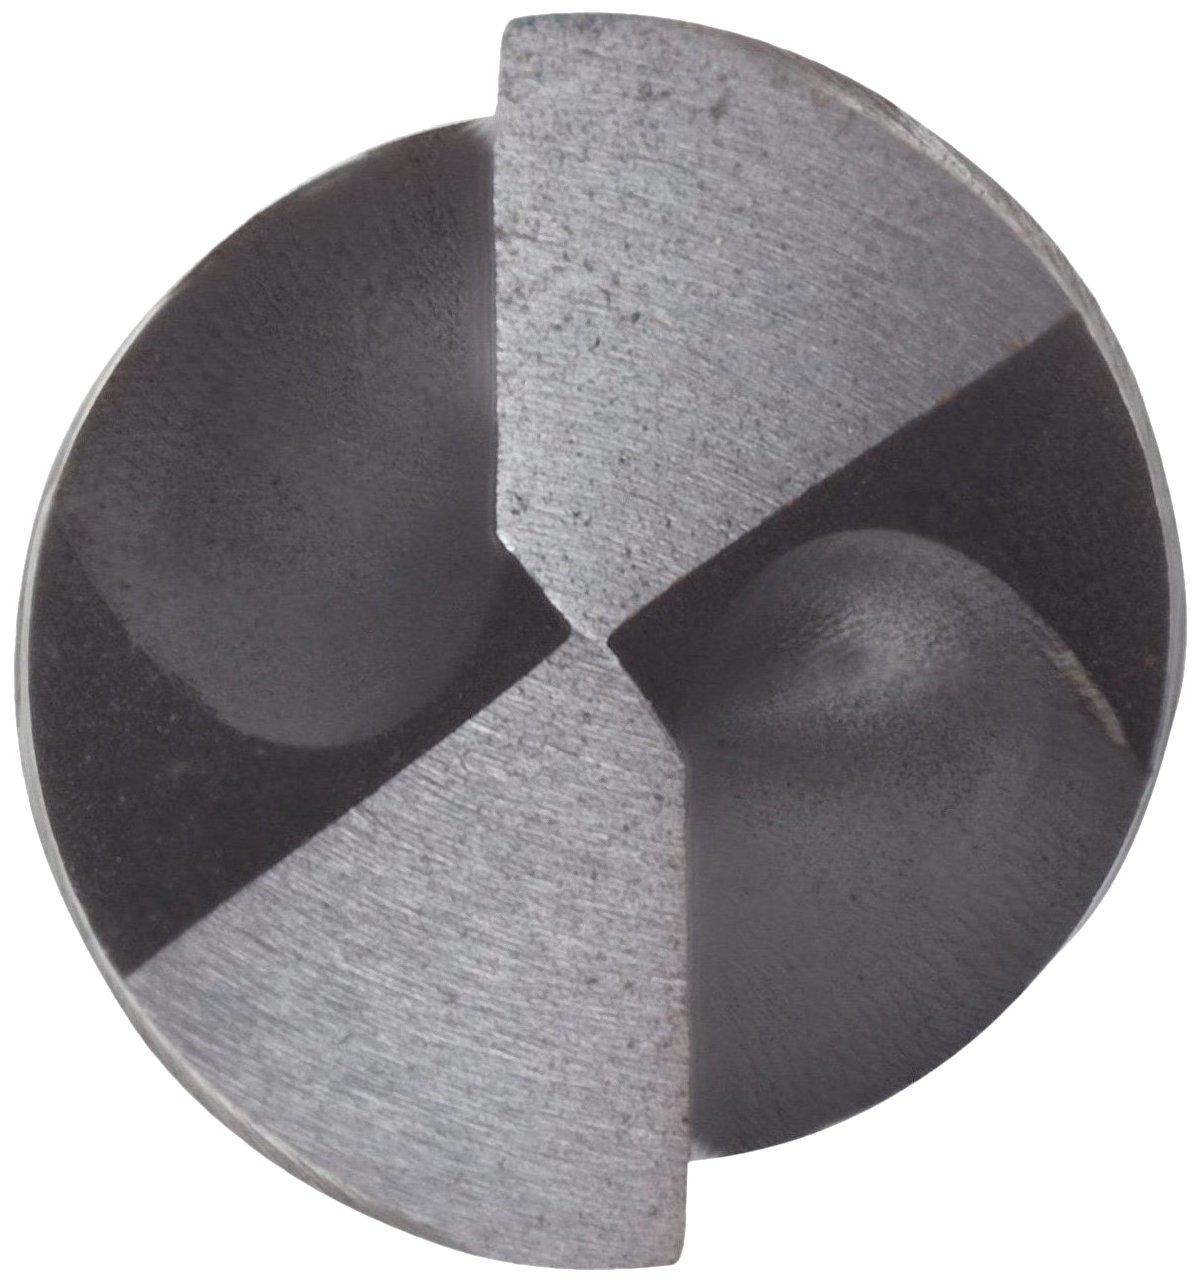 Melin Tool VXMG Carbide Corner Radius End Mill 0.6250 Cutting Diameter 0.03 Corner Radius Helix Roughing Cut 5 Overall Length nACo Monolayer Finish 4 Flutes 0.625 Shank Diameter Variable Helix